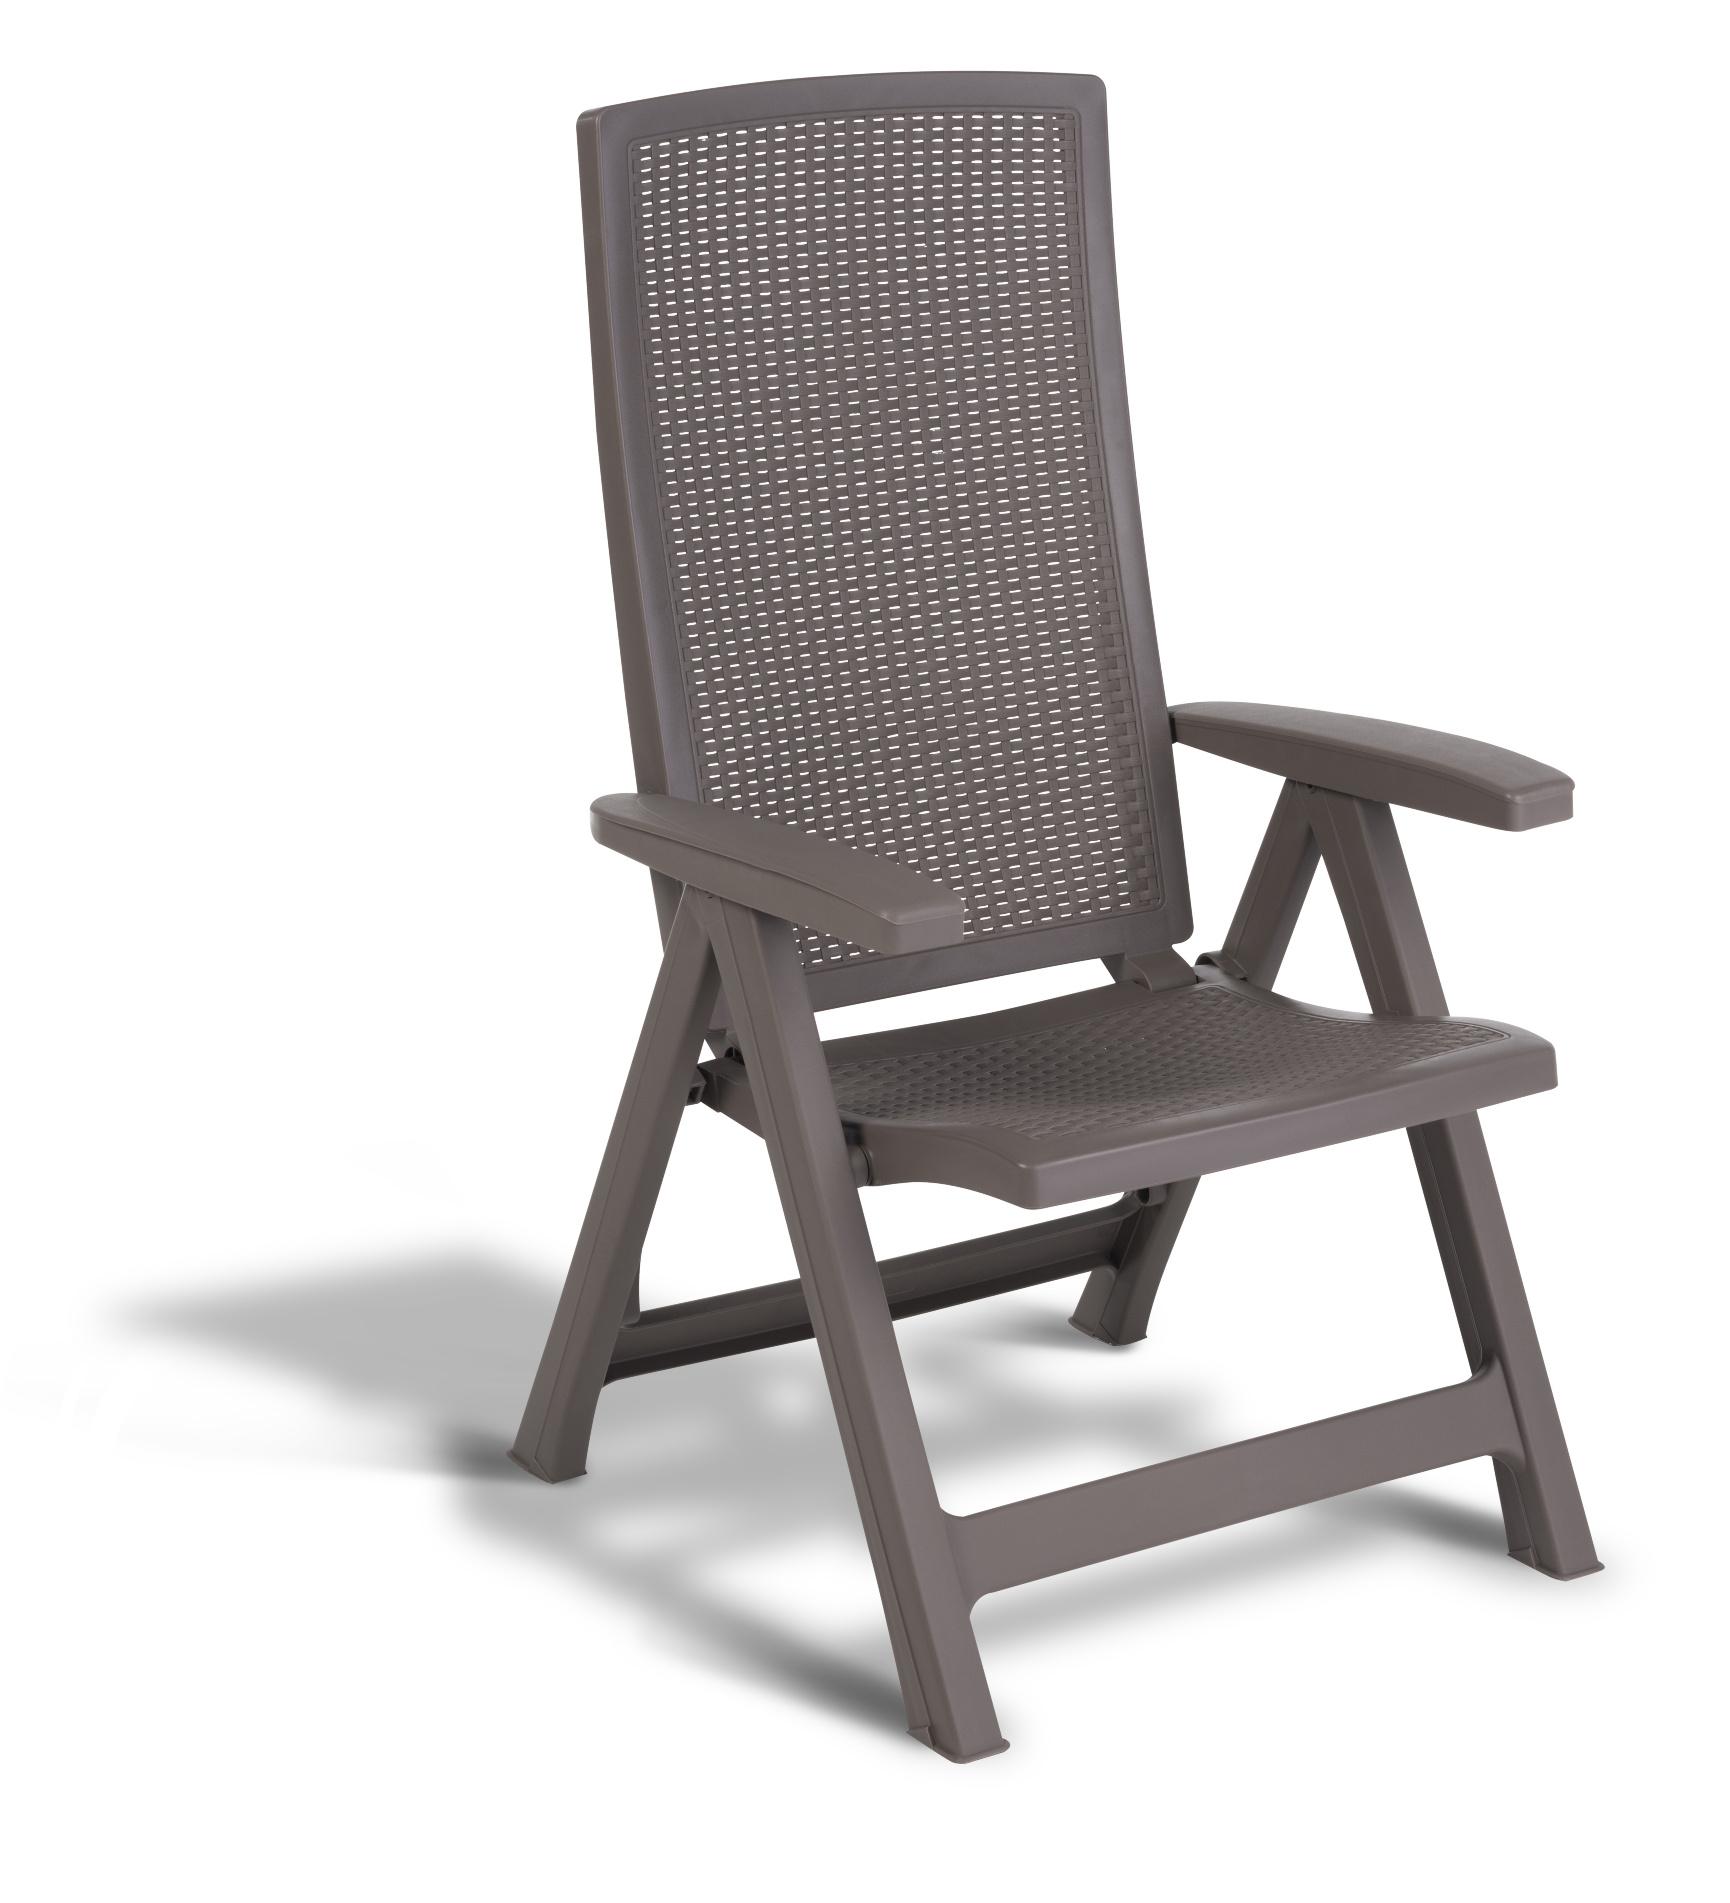 allibert montr al chaise r glable cappuccino allibert. Black Bedroom Furniture Sets. Home Design Ideas